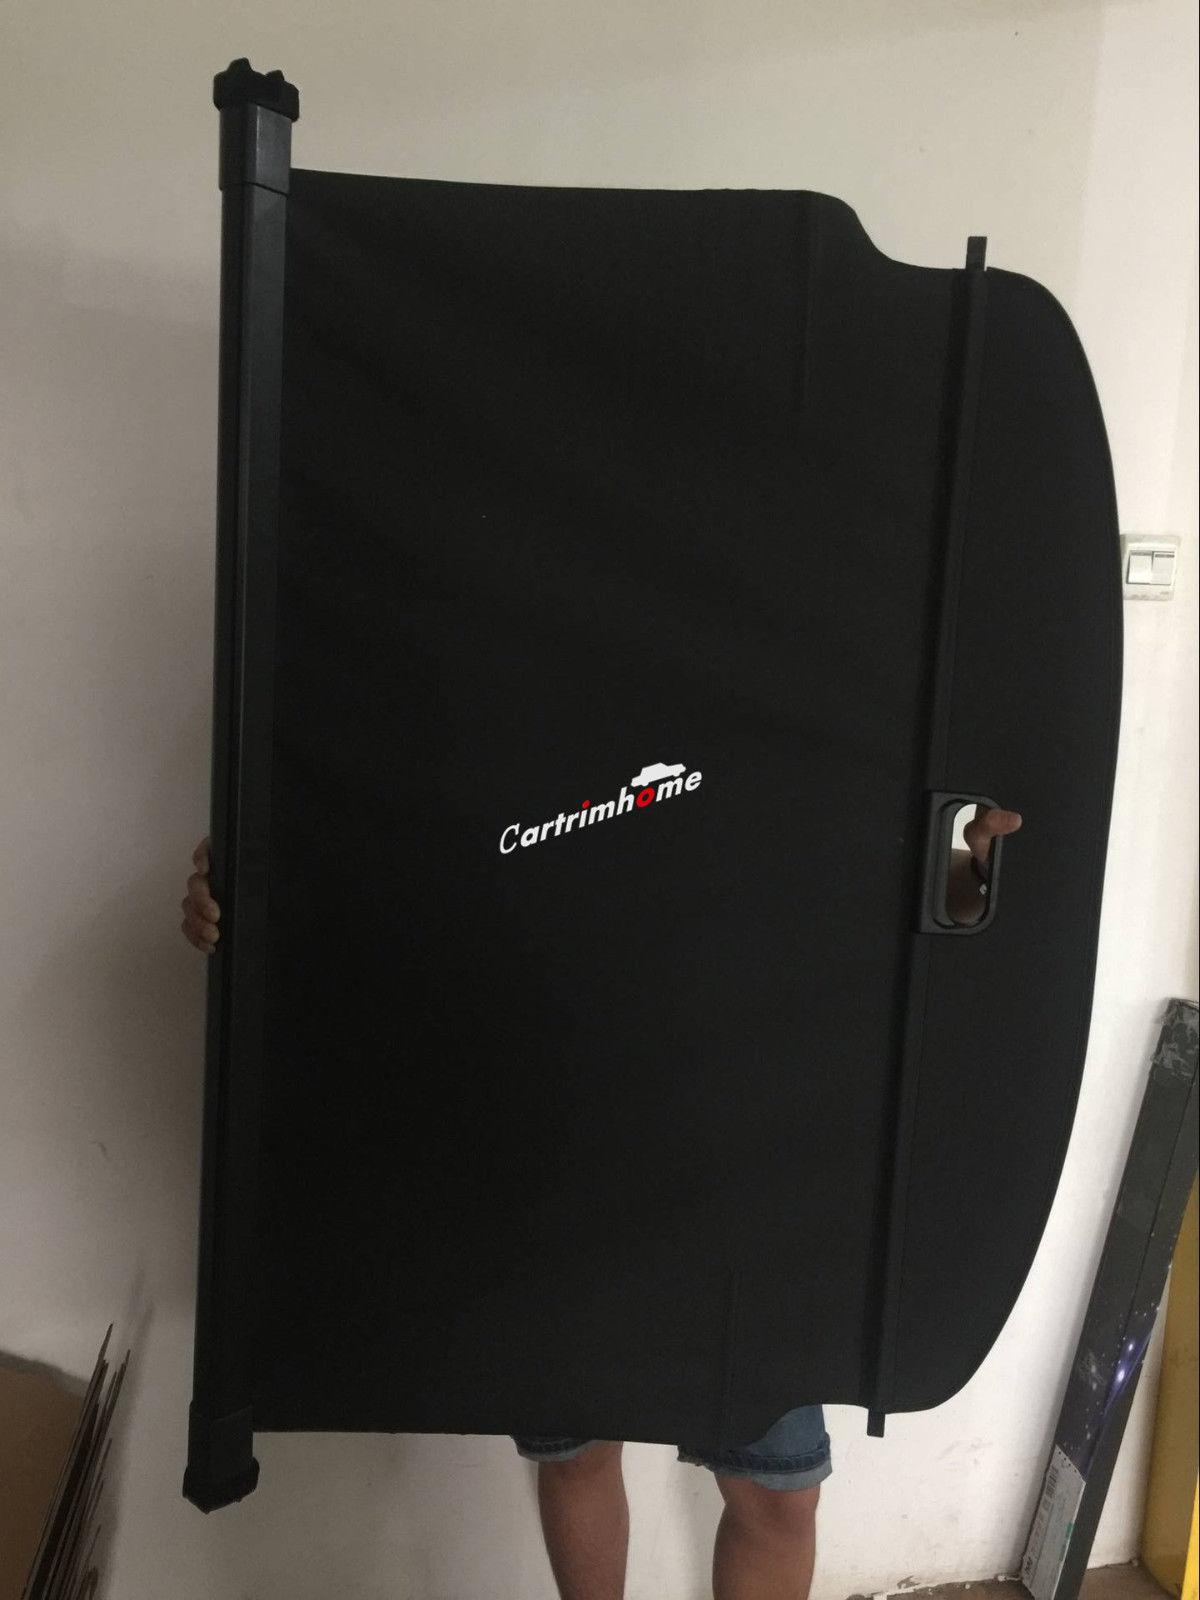 Capa traseira retrátil do tronco da carga 1 conjunto para land rover discovery sport 2015-2018